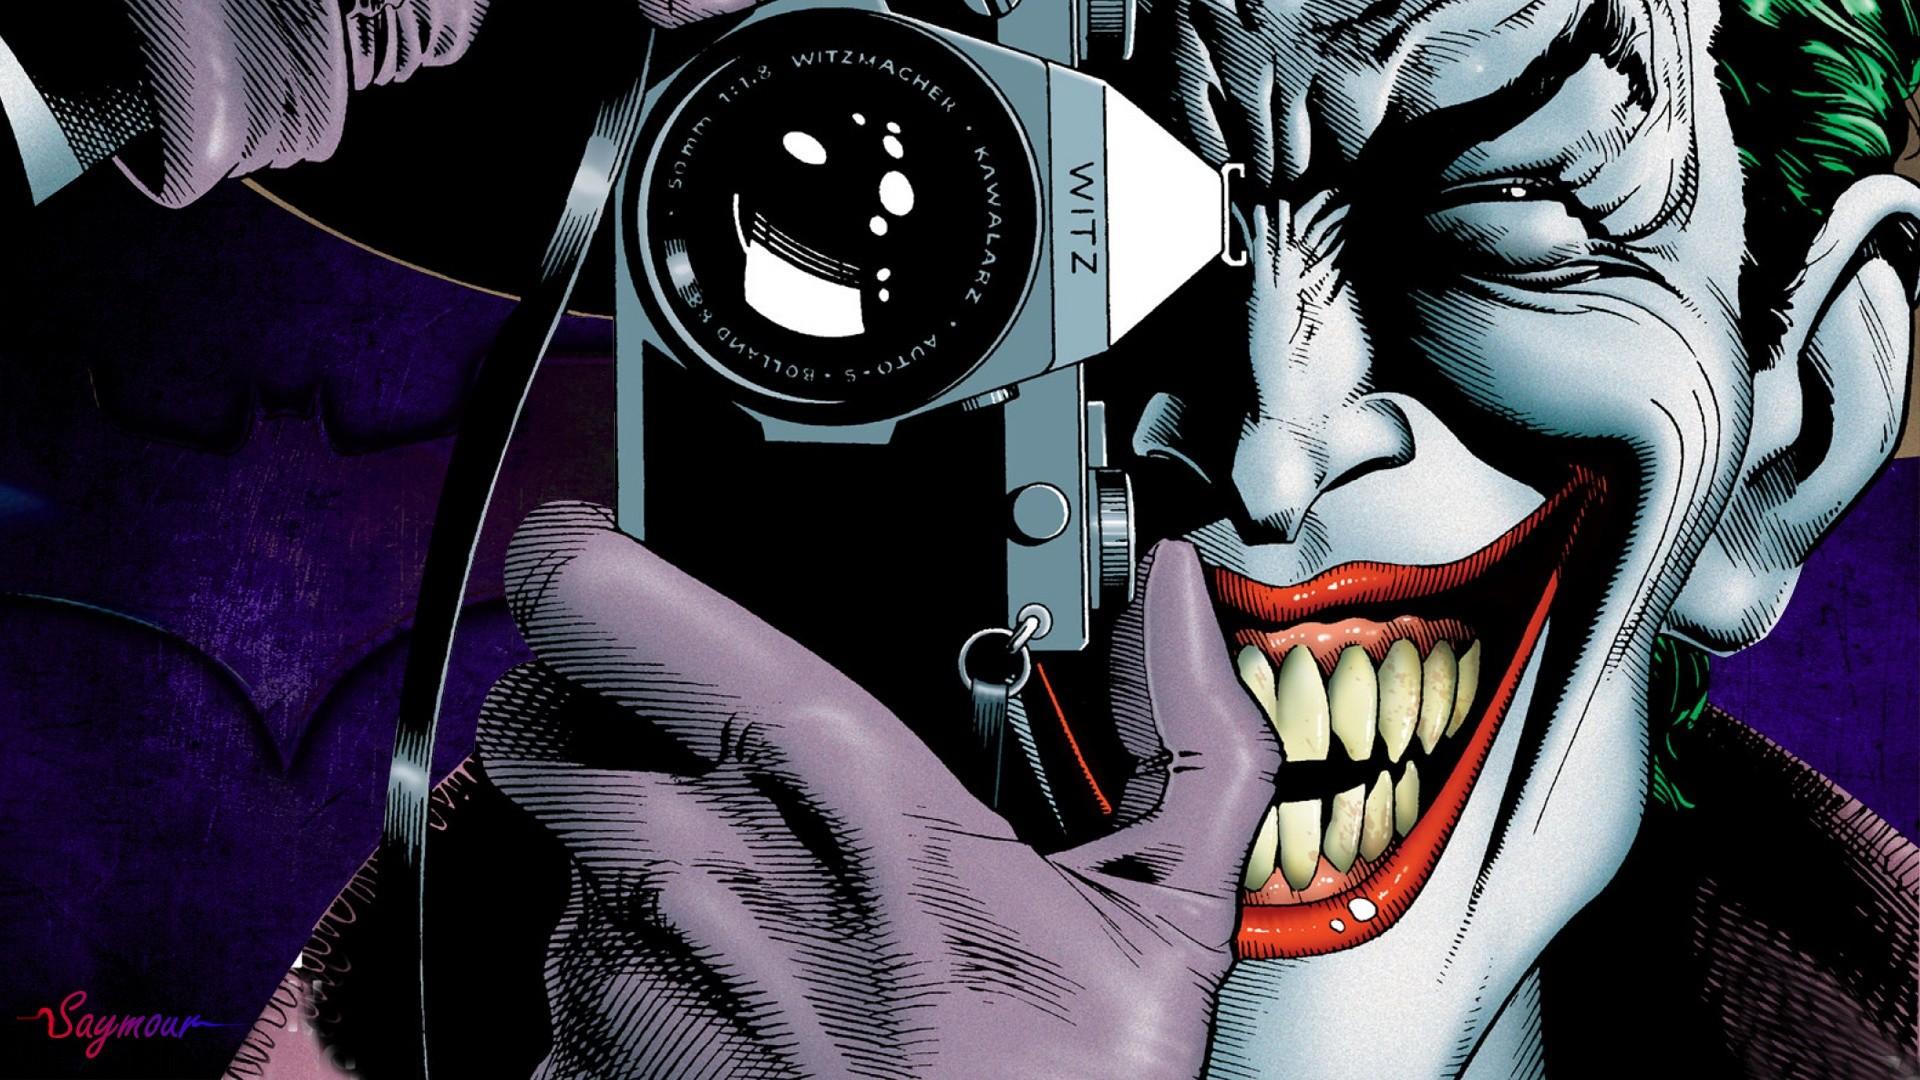 Harley Quinn Wallpaper 1080p: Wallpapers for Gt The Joker Animated Wallpaper  1920x1080px